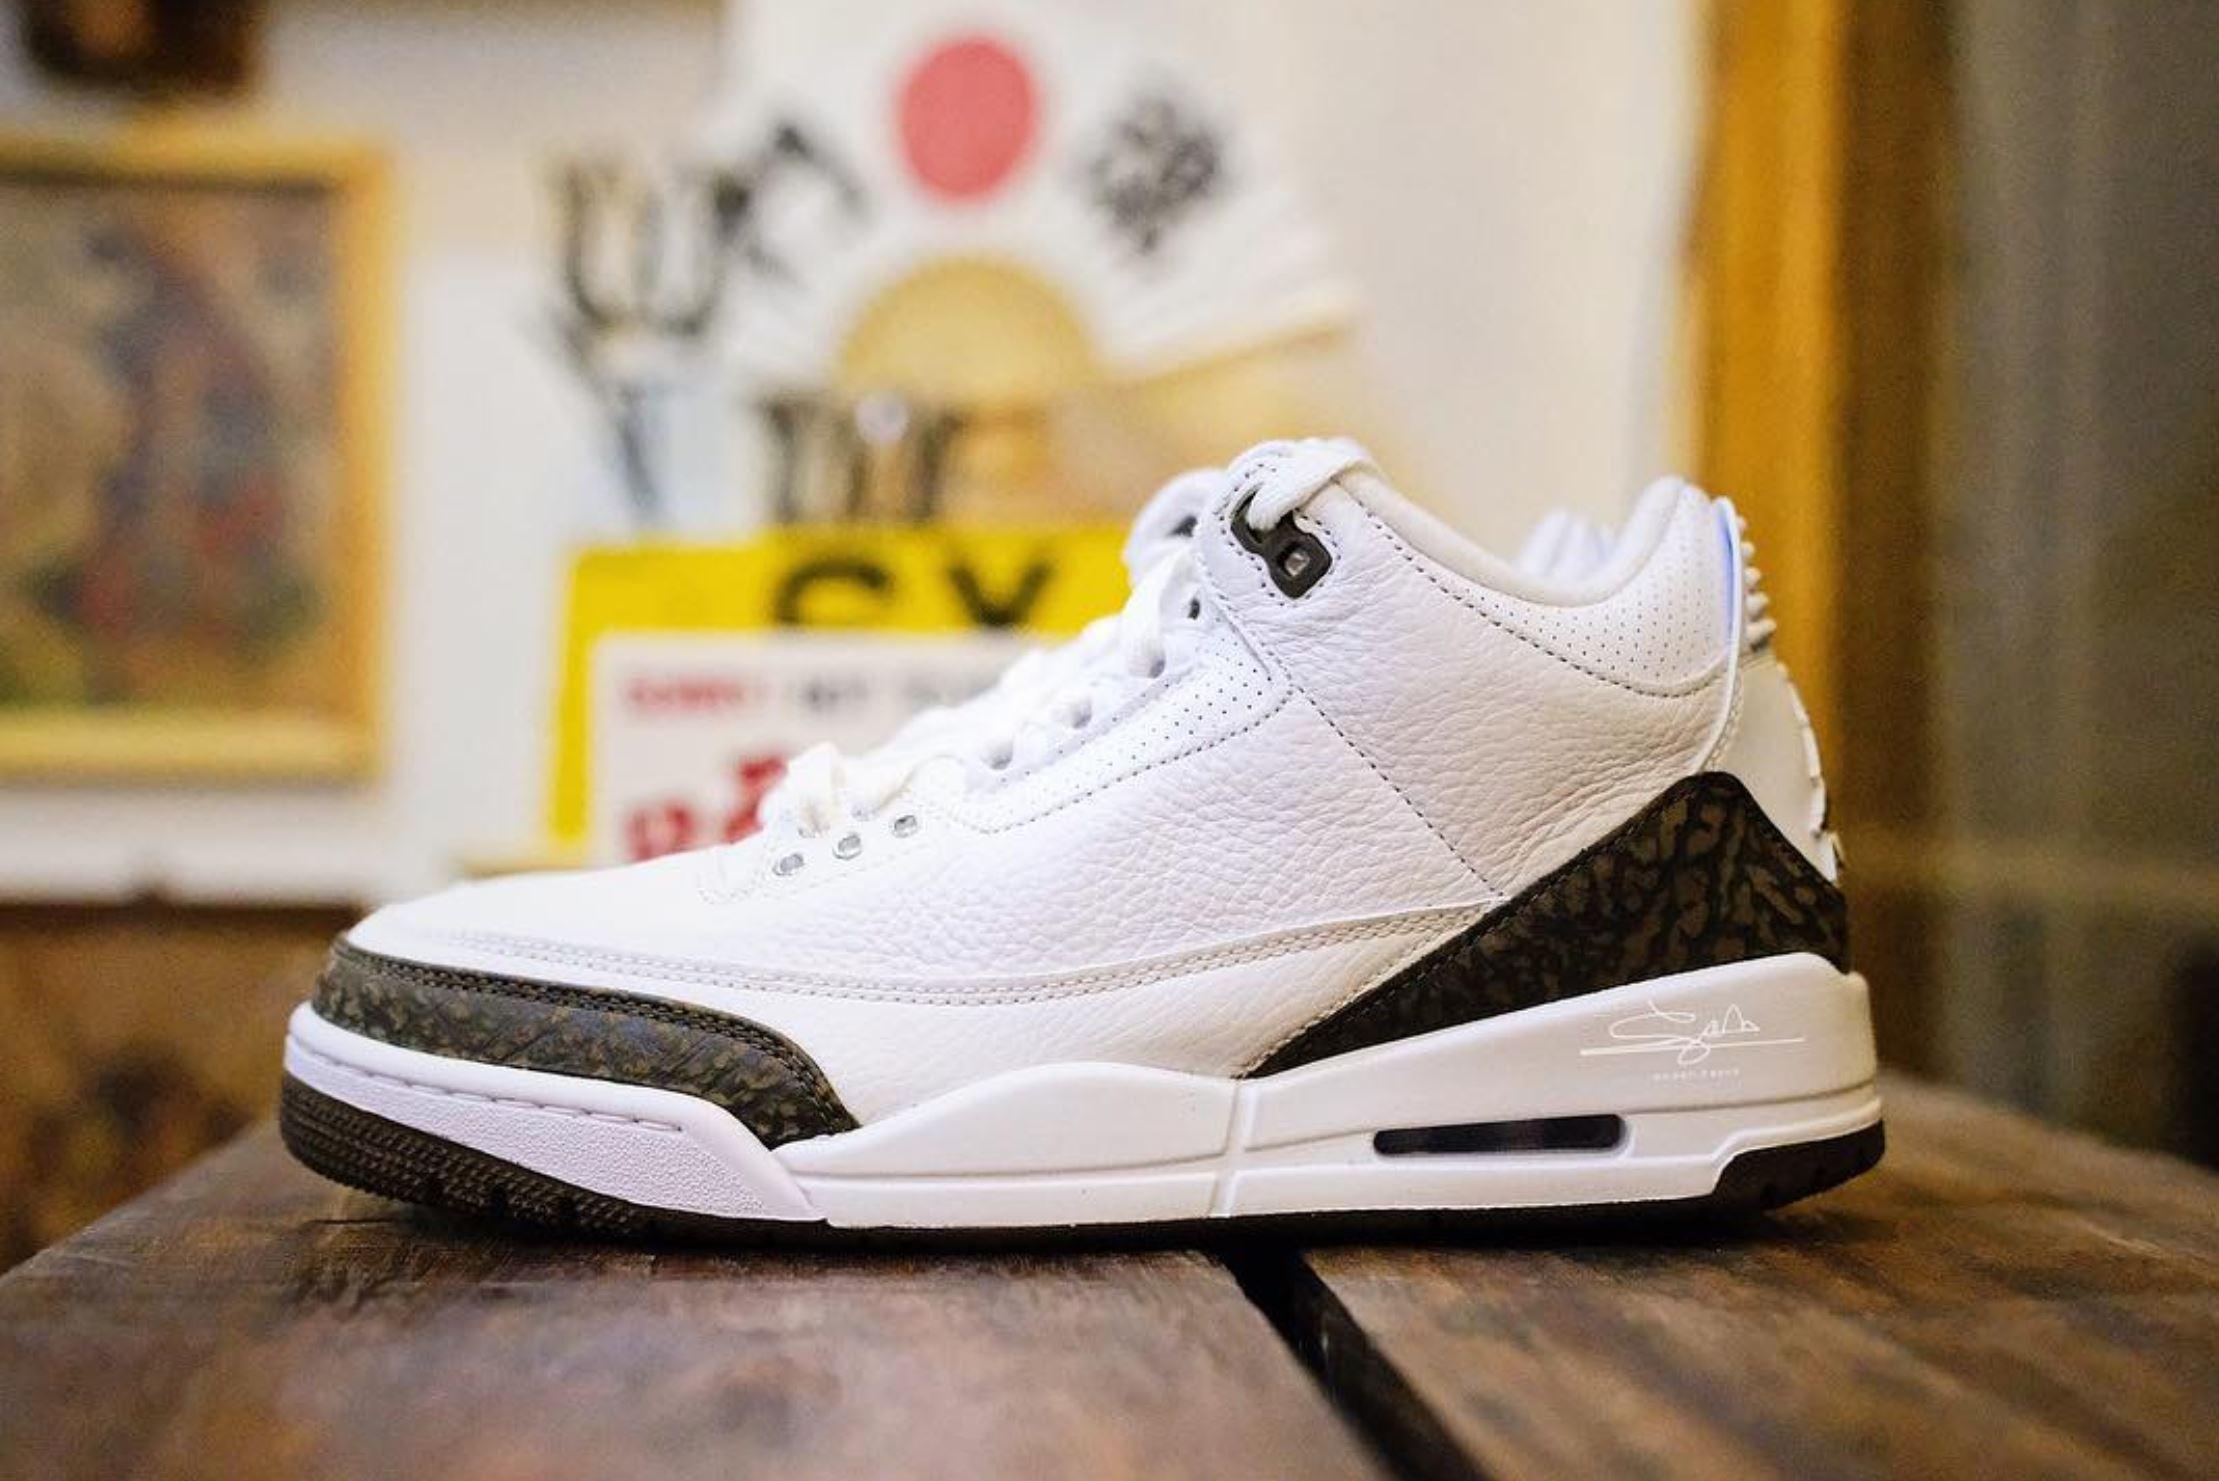 Jordan Brand   Kicks On Court   Retro Lifestyle ... 884375daa